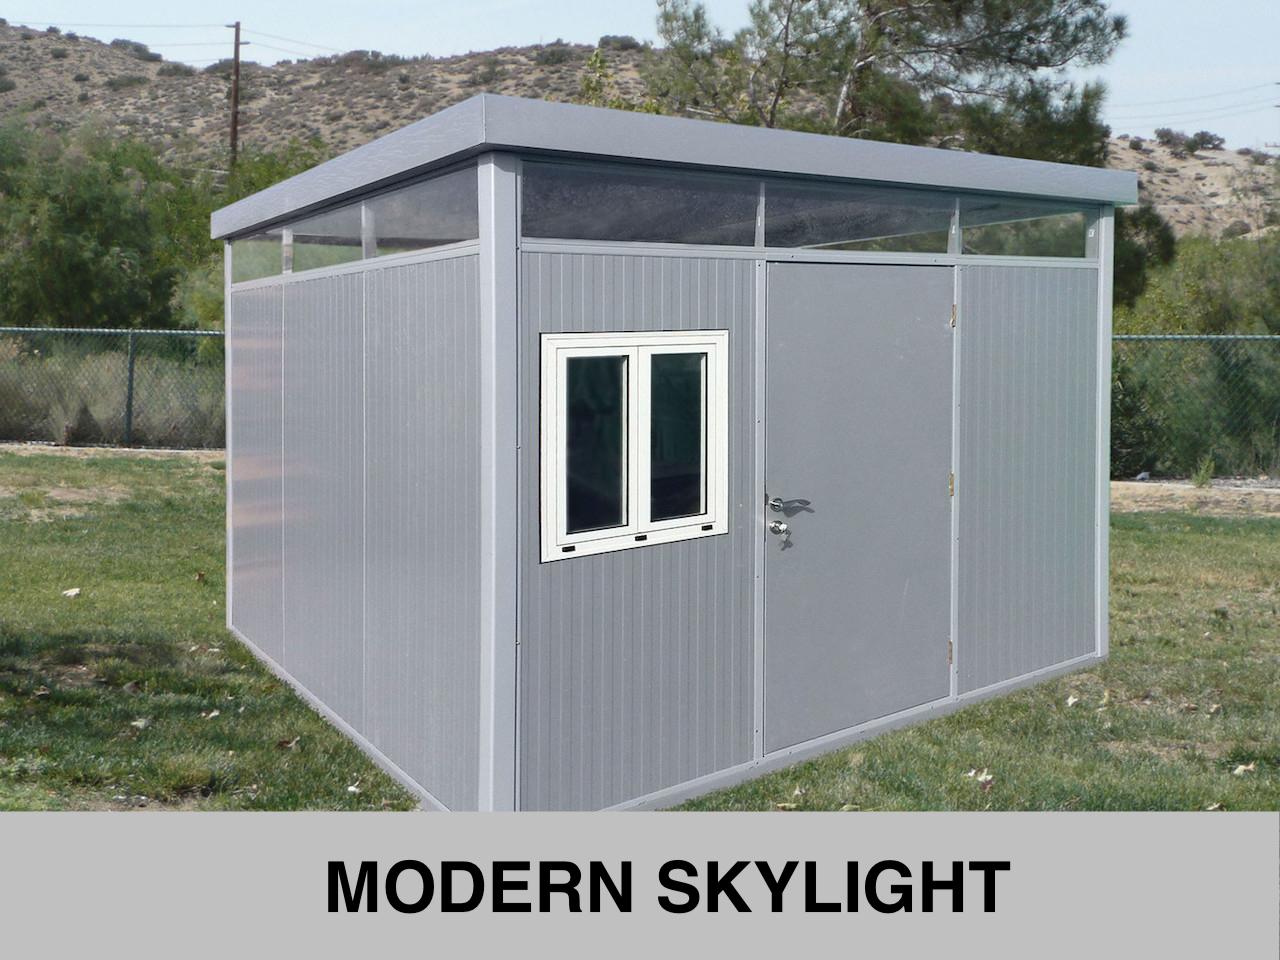 MODERN SKYLIGHT